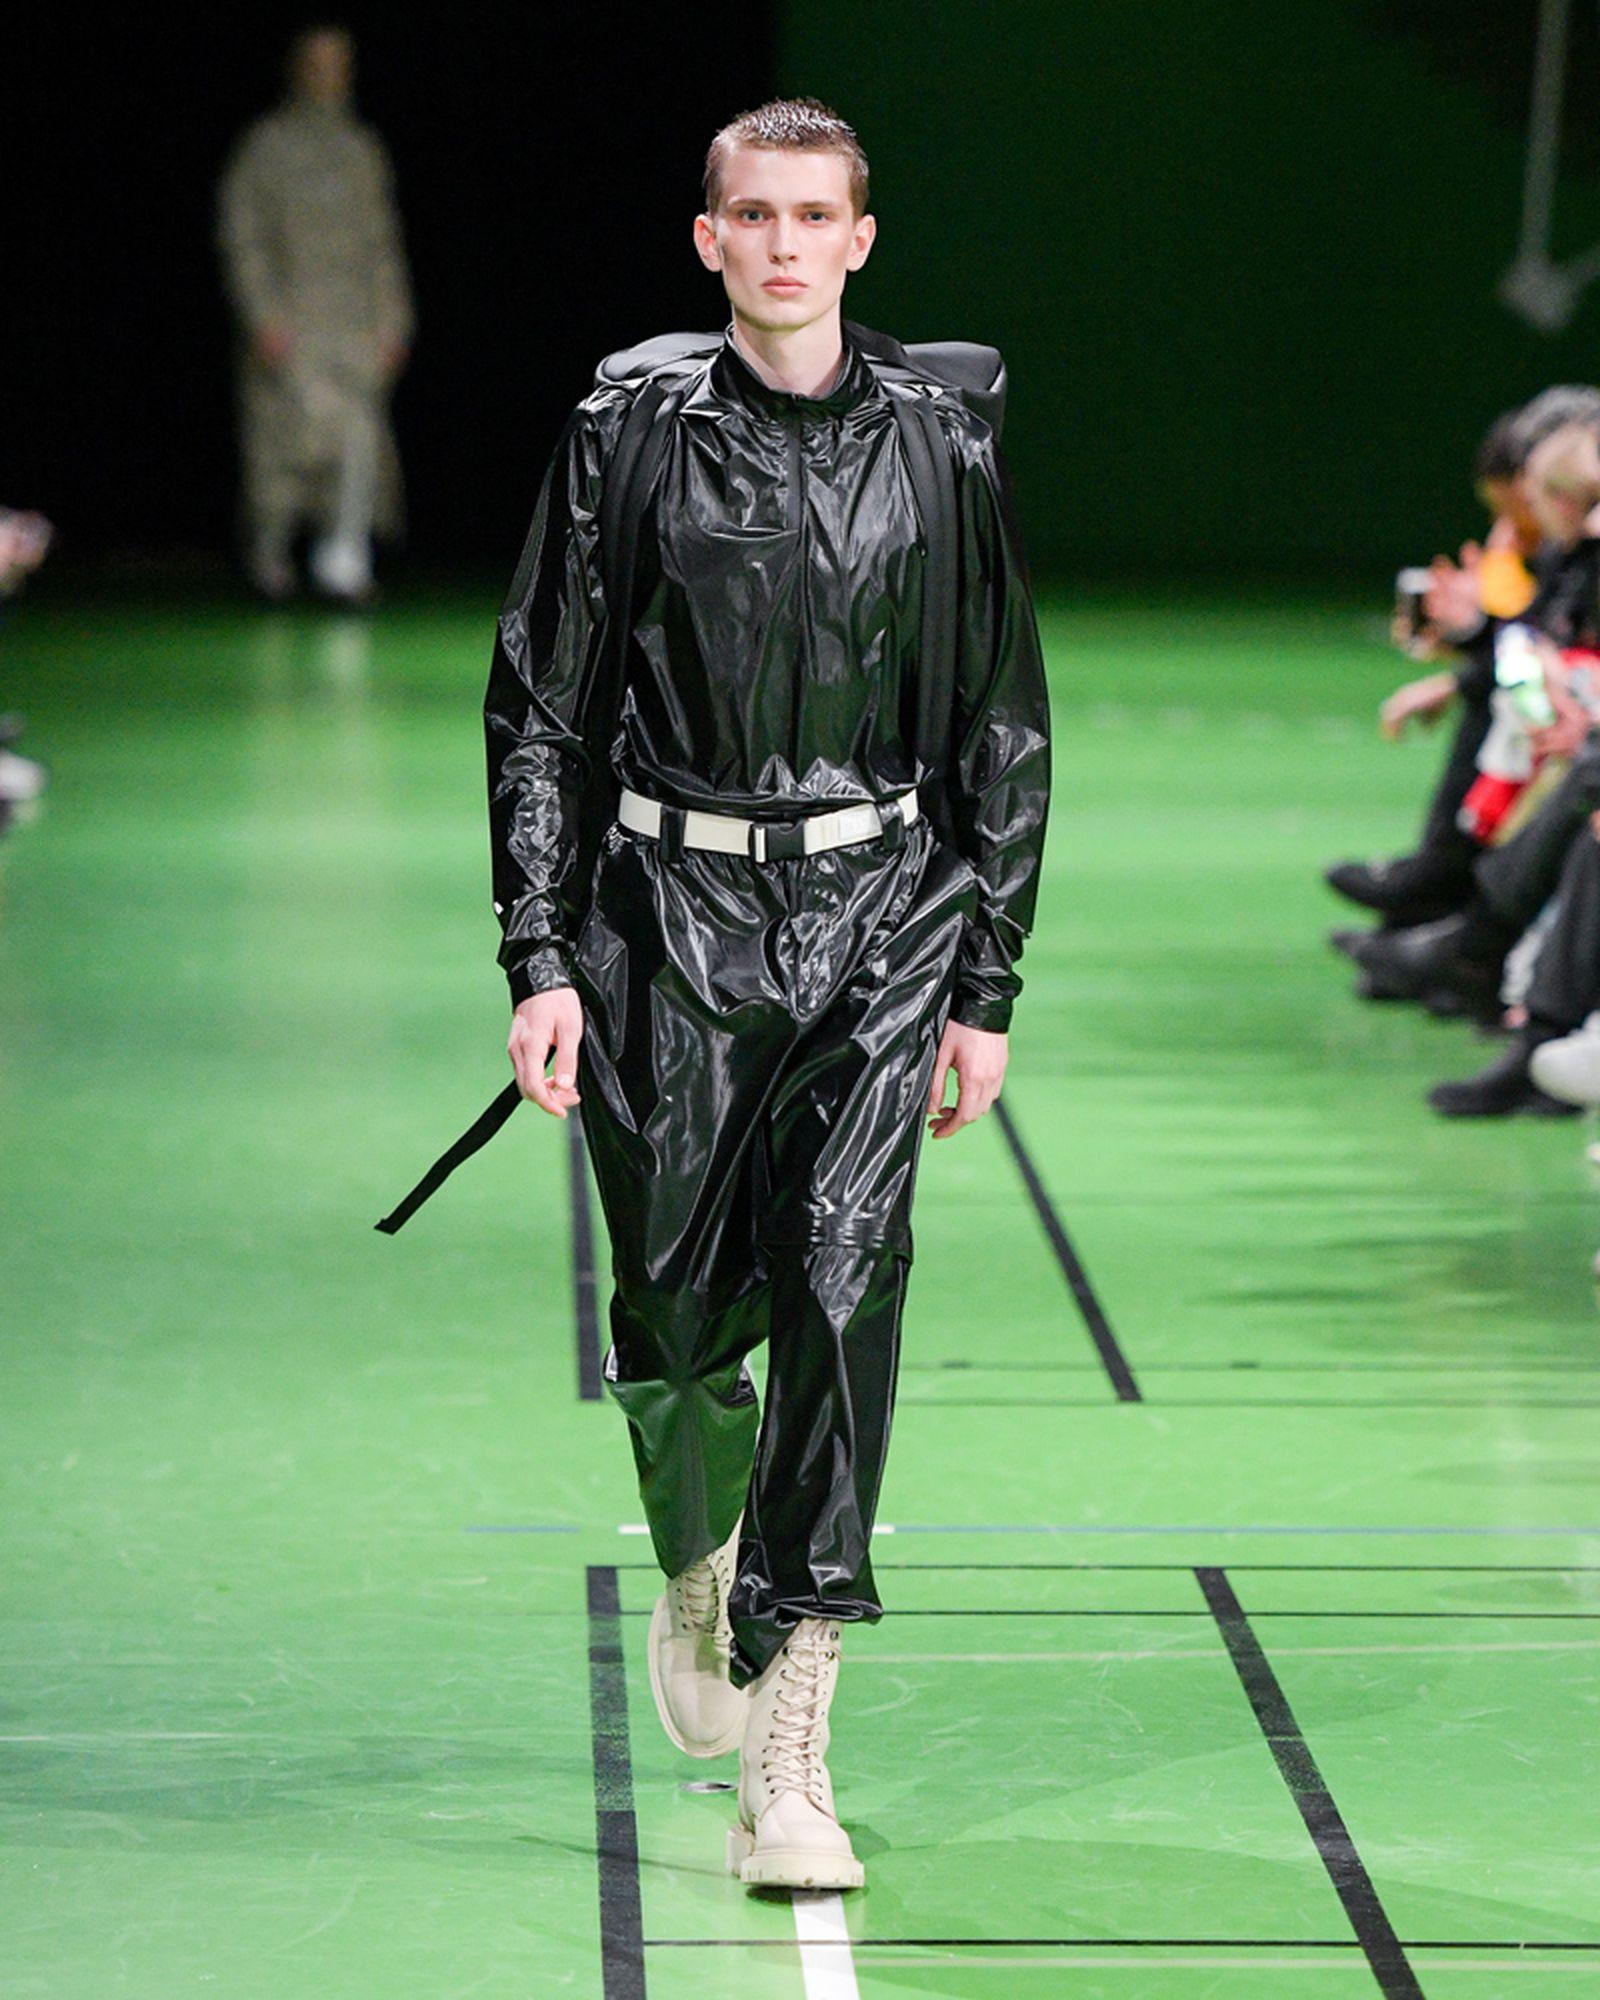 future-fashion-week-copenhagen-rains-2